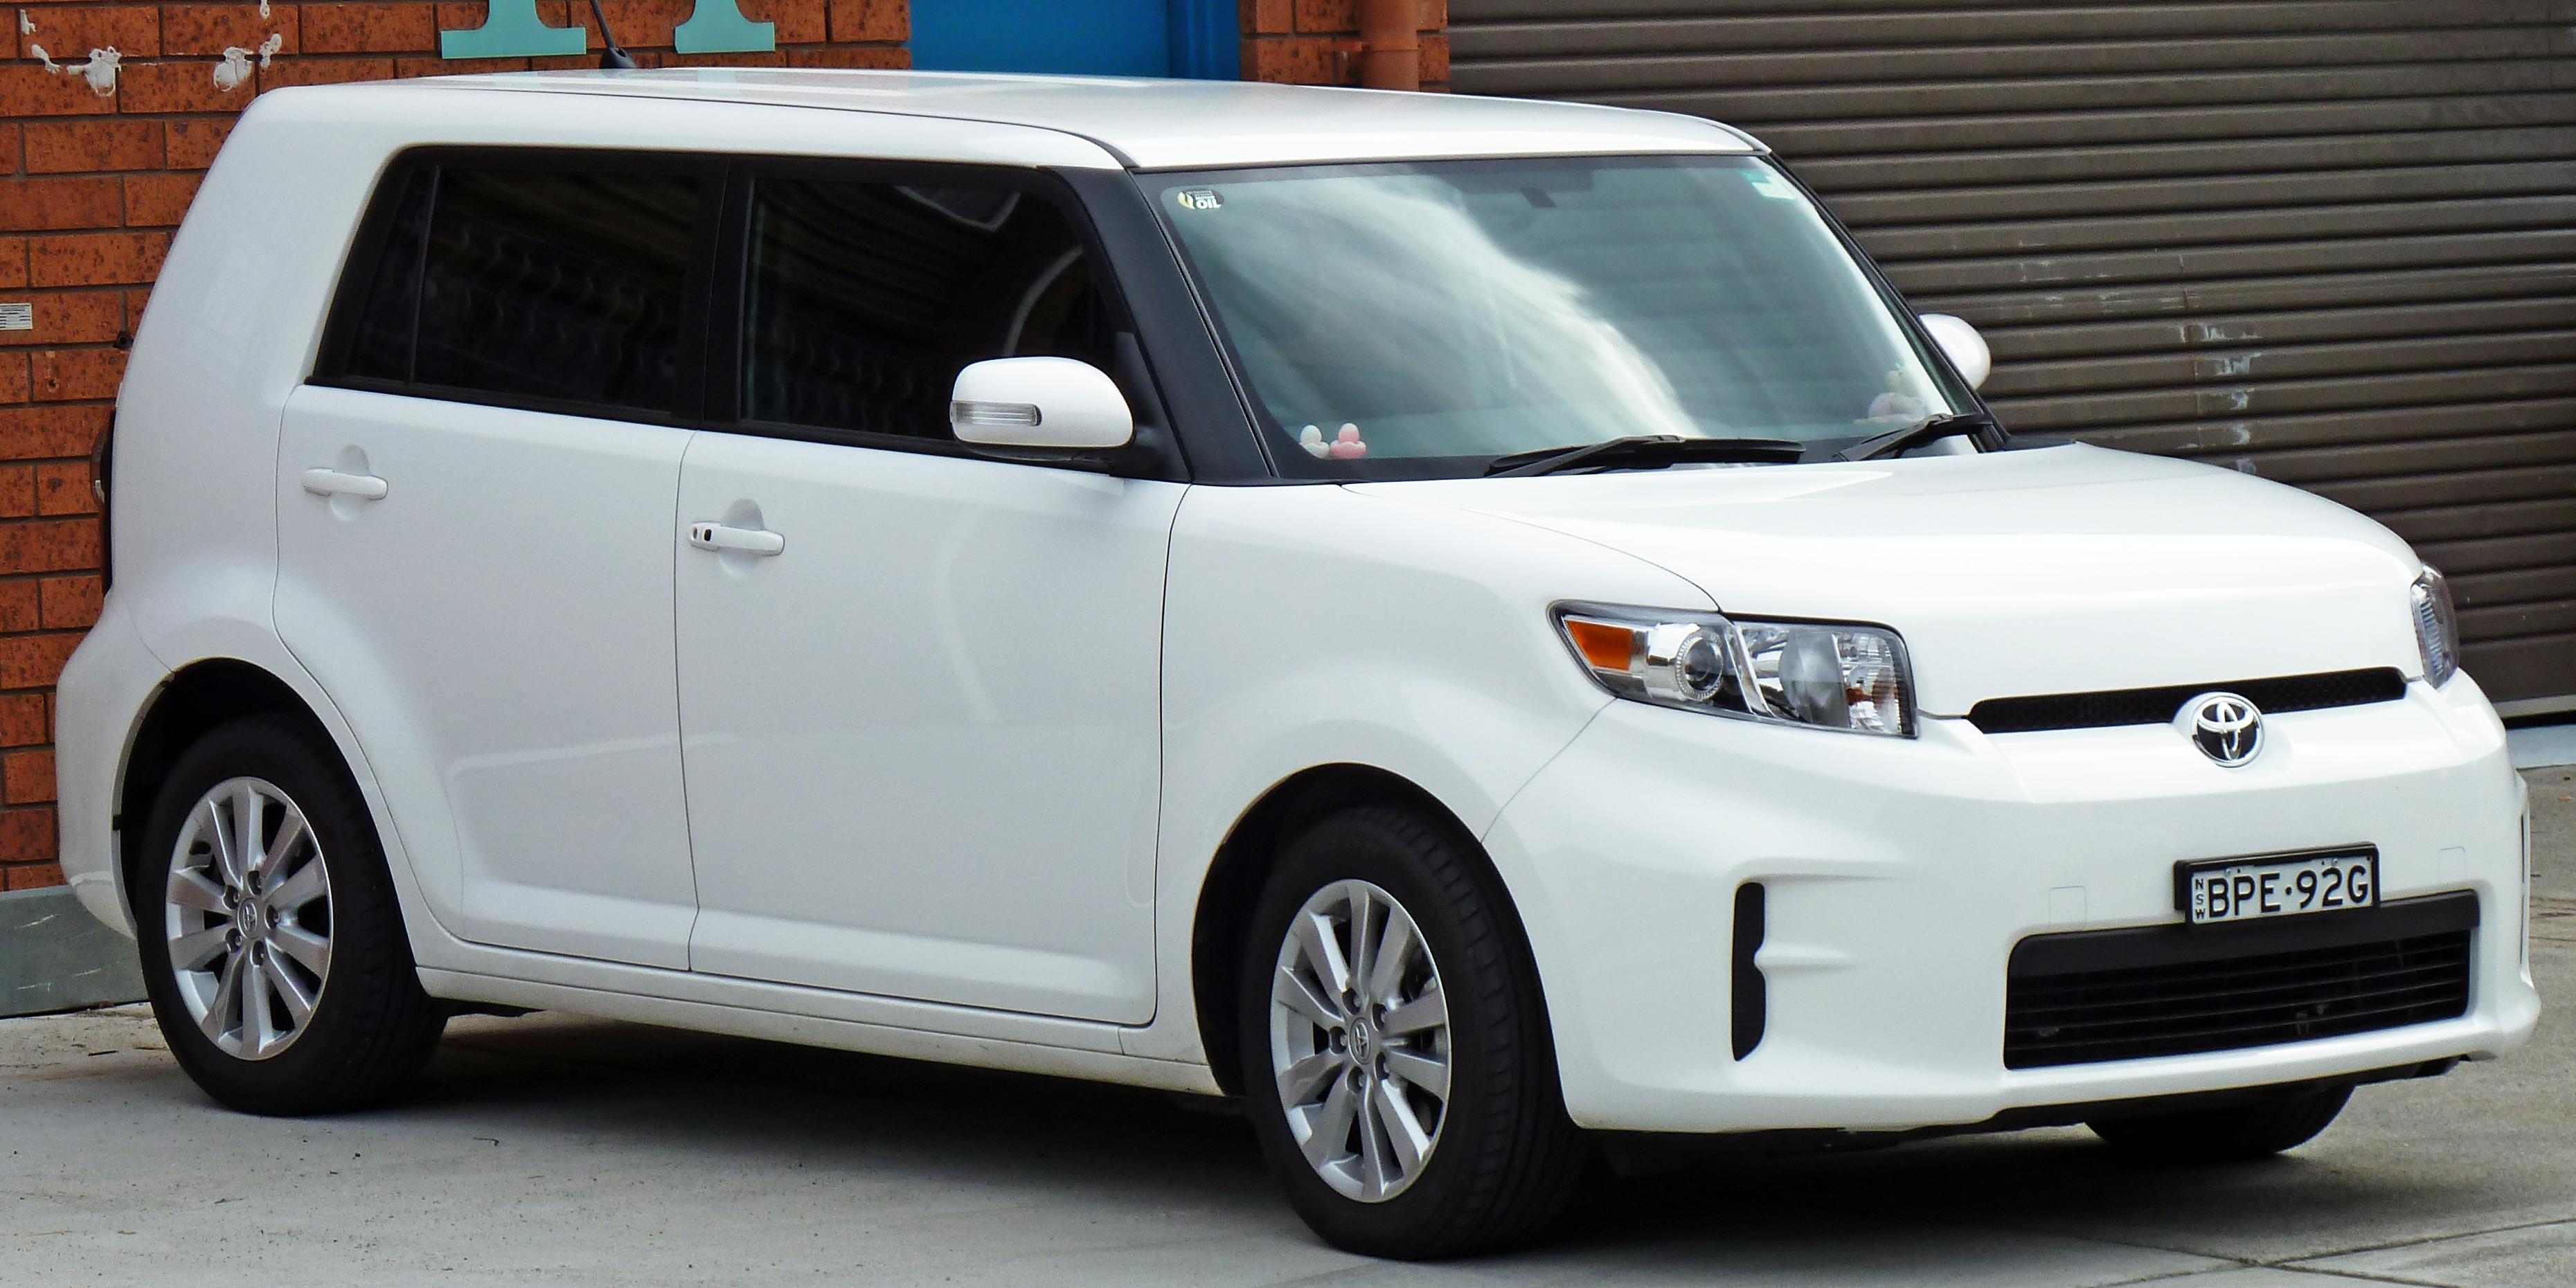 Description 2010 Toyota Rukus (AZE151R) hatchback 01.jpg